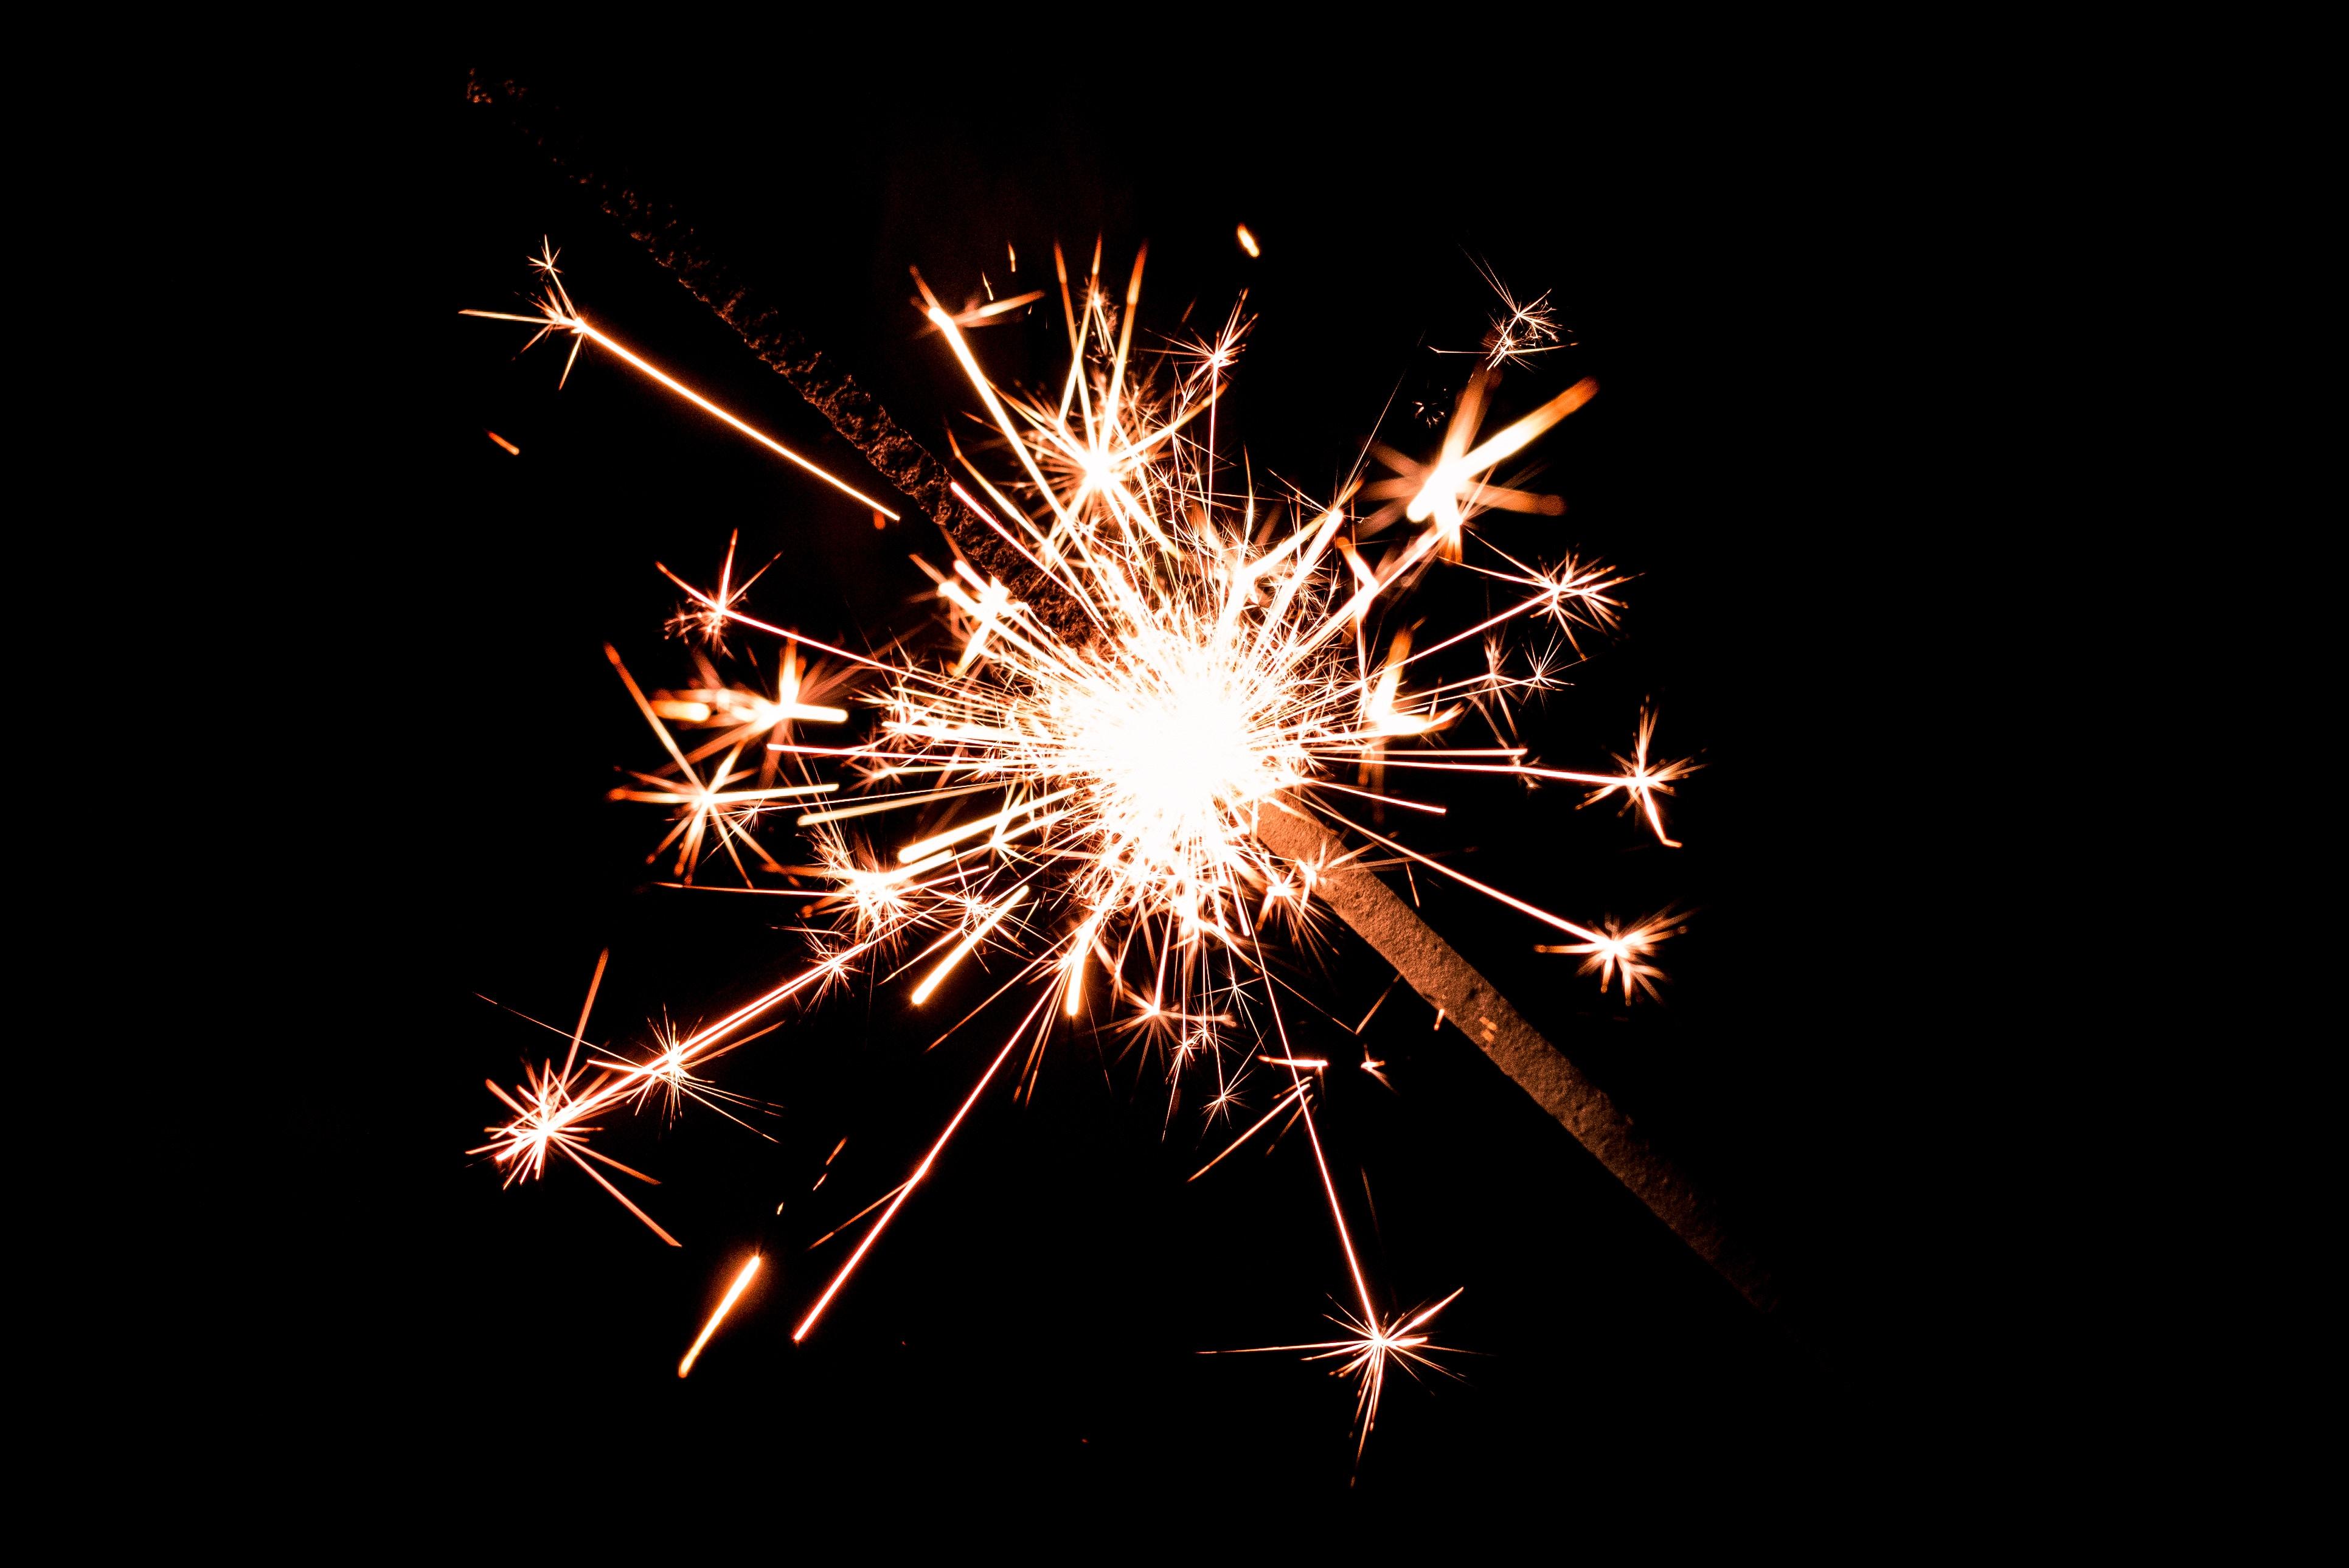 Sparkler Igniting